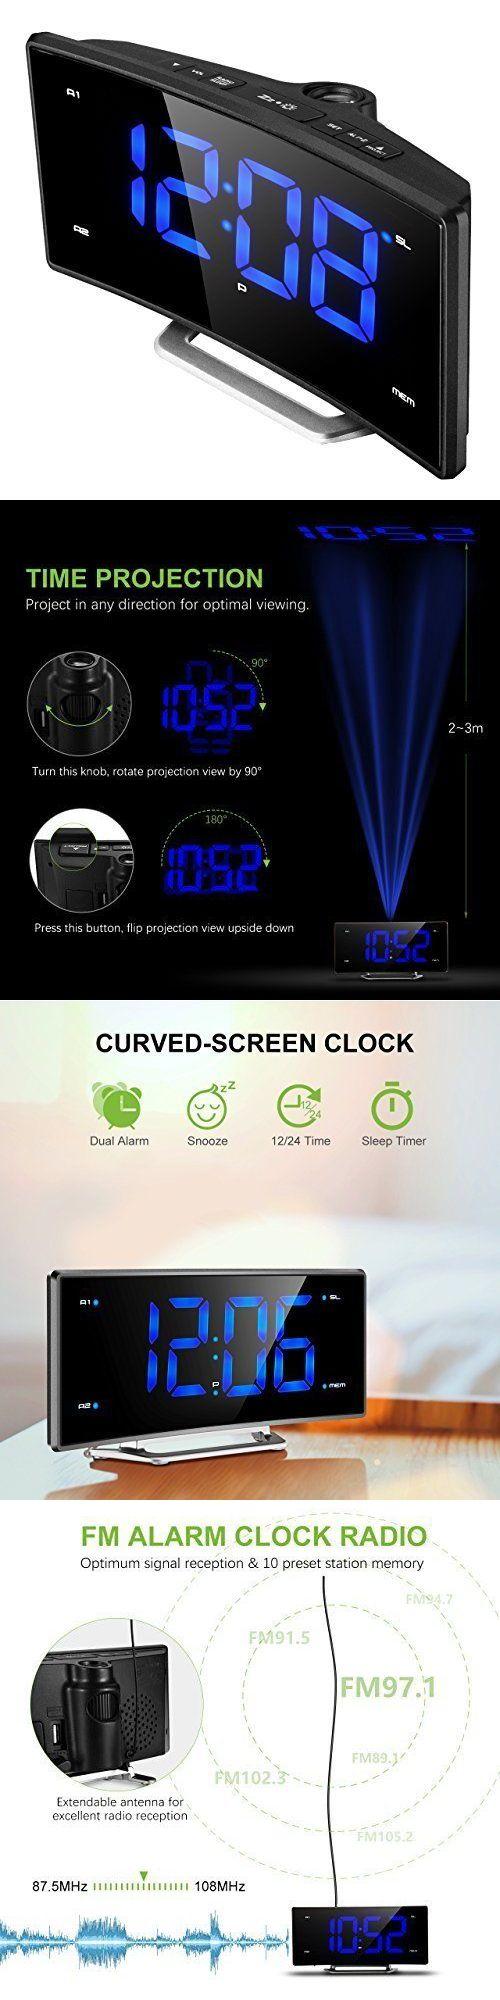 Digital Clocks and Clock Radios: Projection Alarm Clock Curved Screen Digital Fm Radio Led Display Usb Charging -> BUY IT NOW ONLY: $49.99 on eBay!